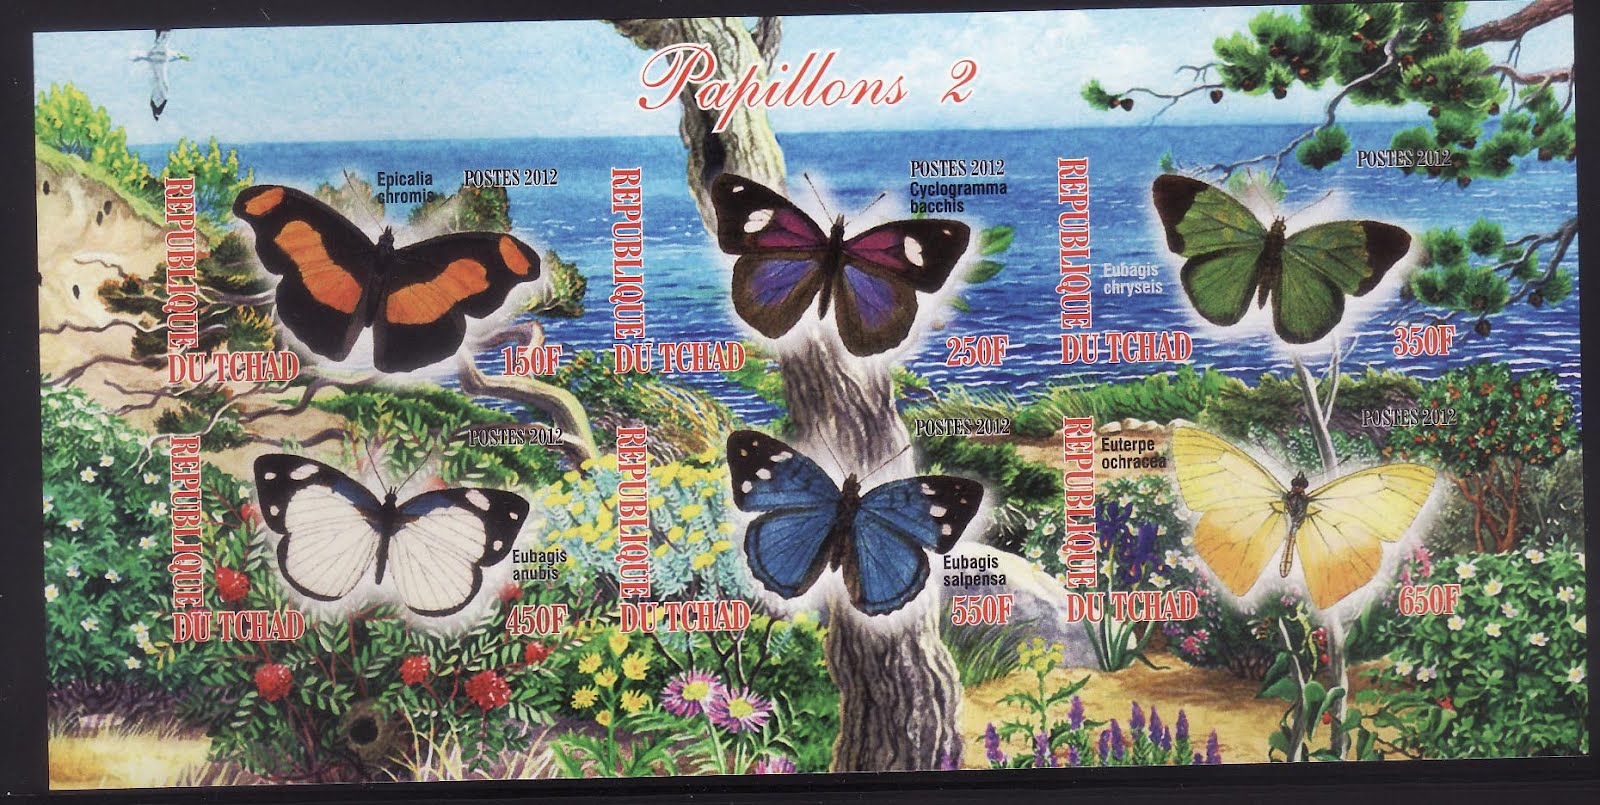 Koleksi Gambar Animasi Flora Dan Fauna Kantor Meme